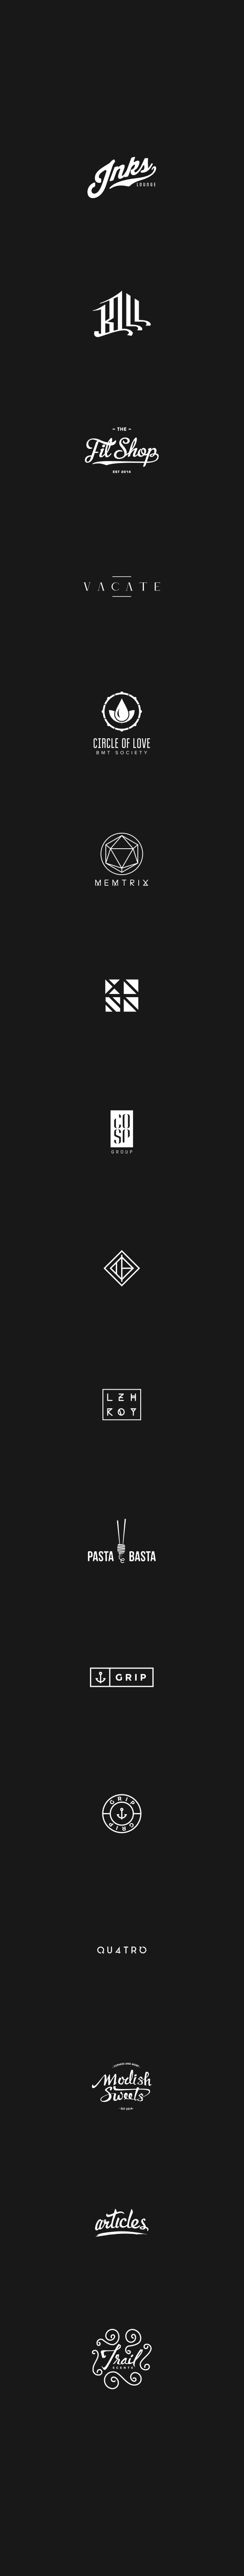 Logo Collection 2014 Q1